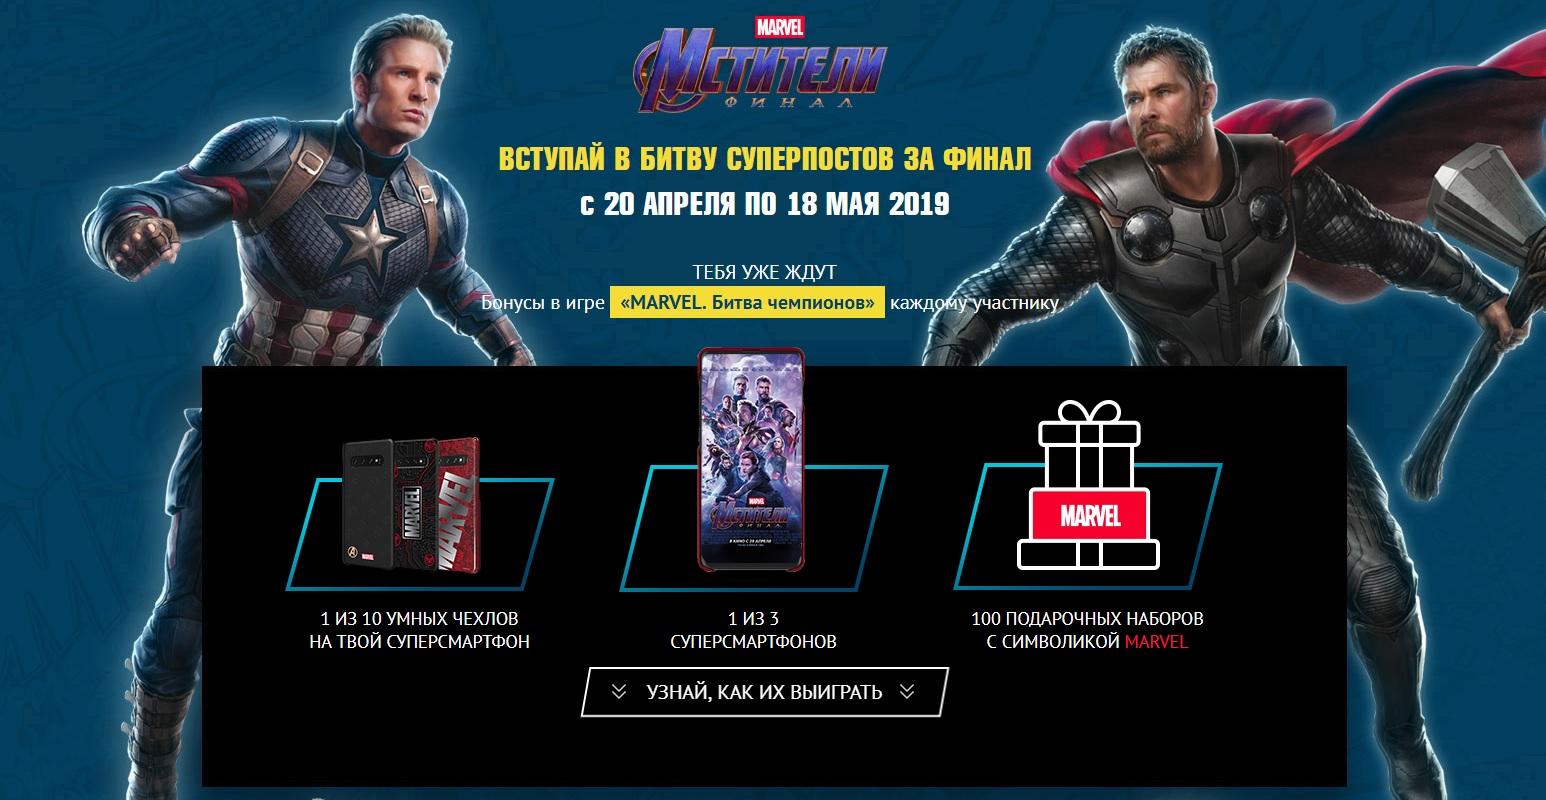 www.marvel.com.ru конкурс 2019 года